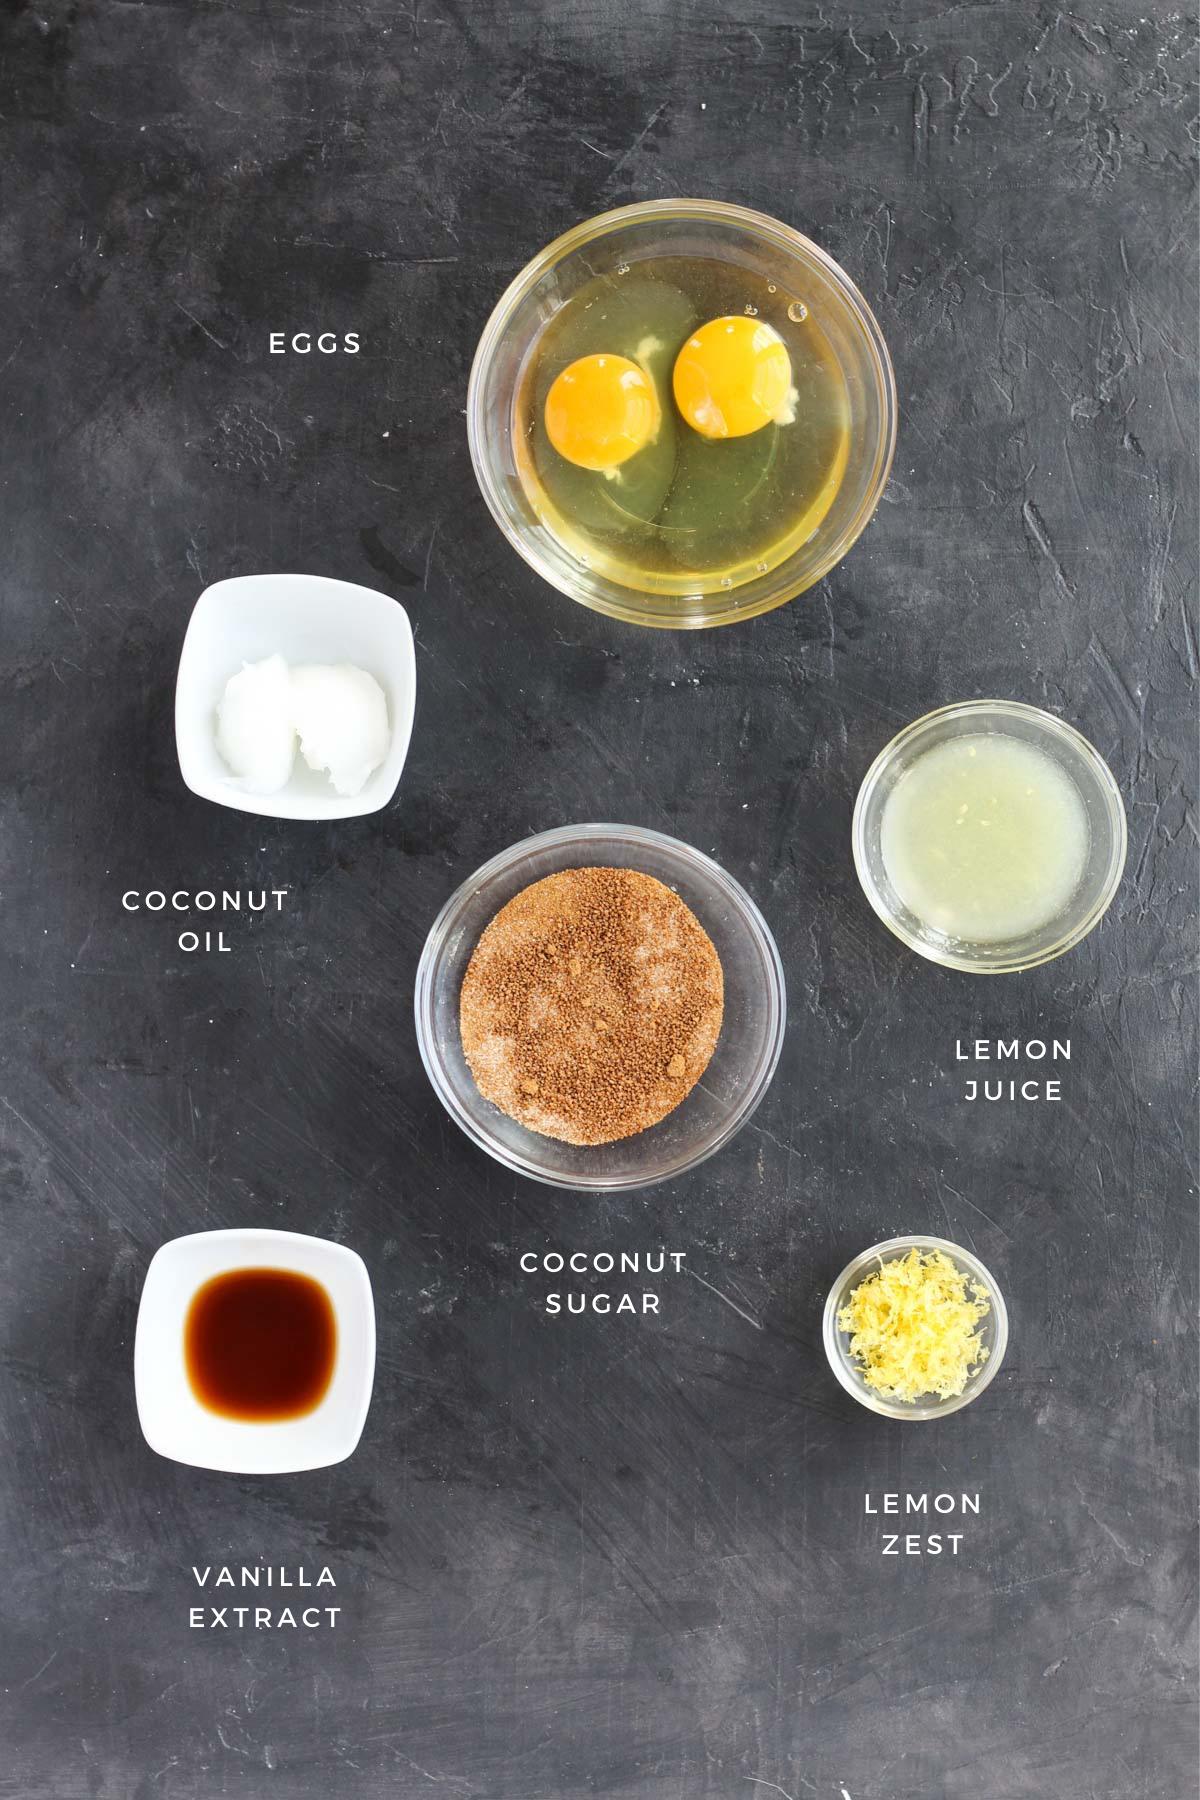 Wet ingredients for thumbprint cookies.